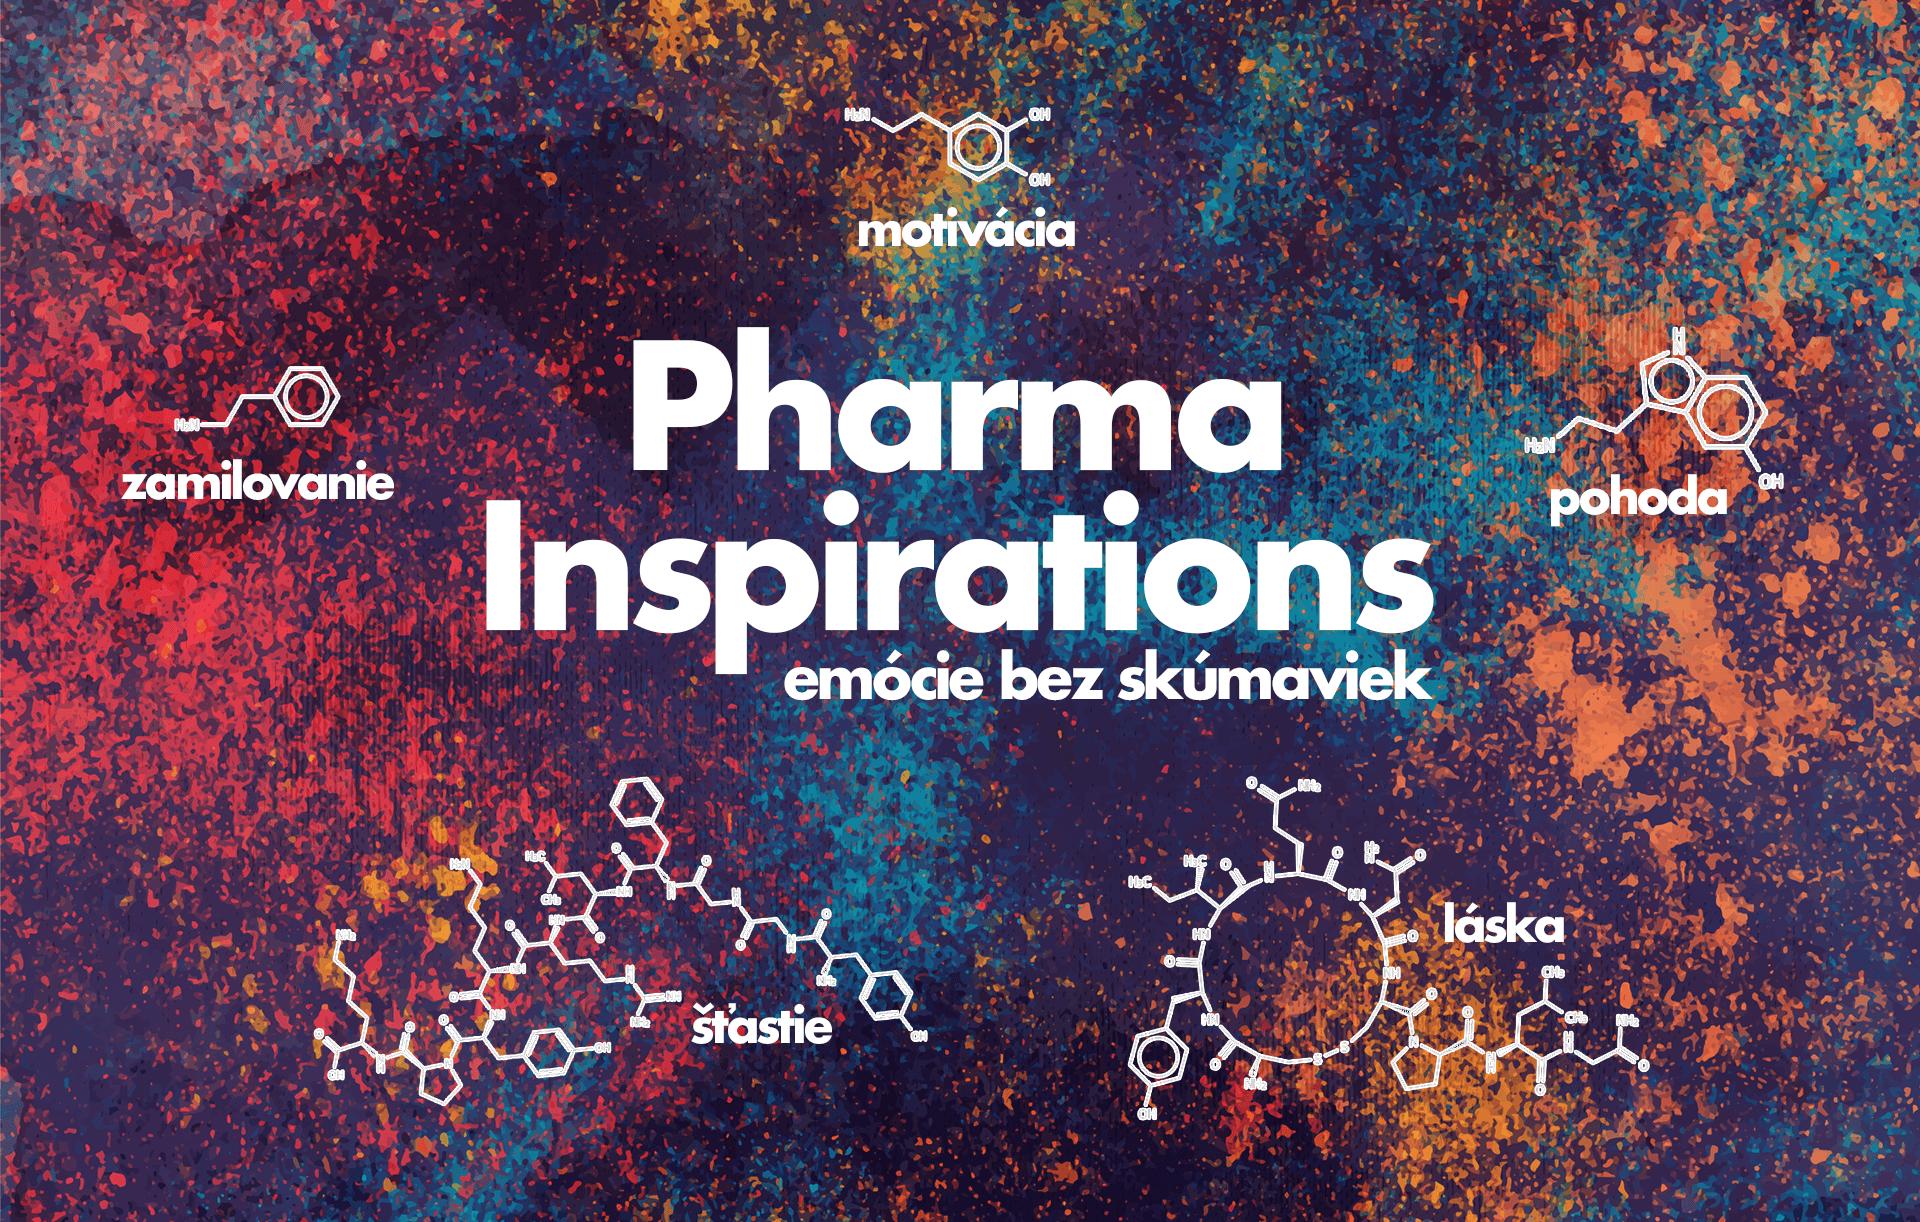 Pharma Inspirations